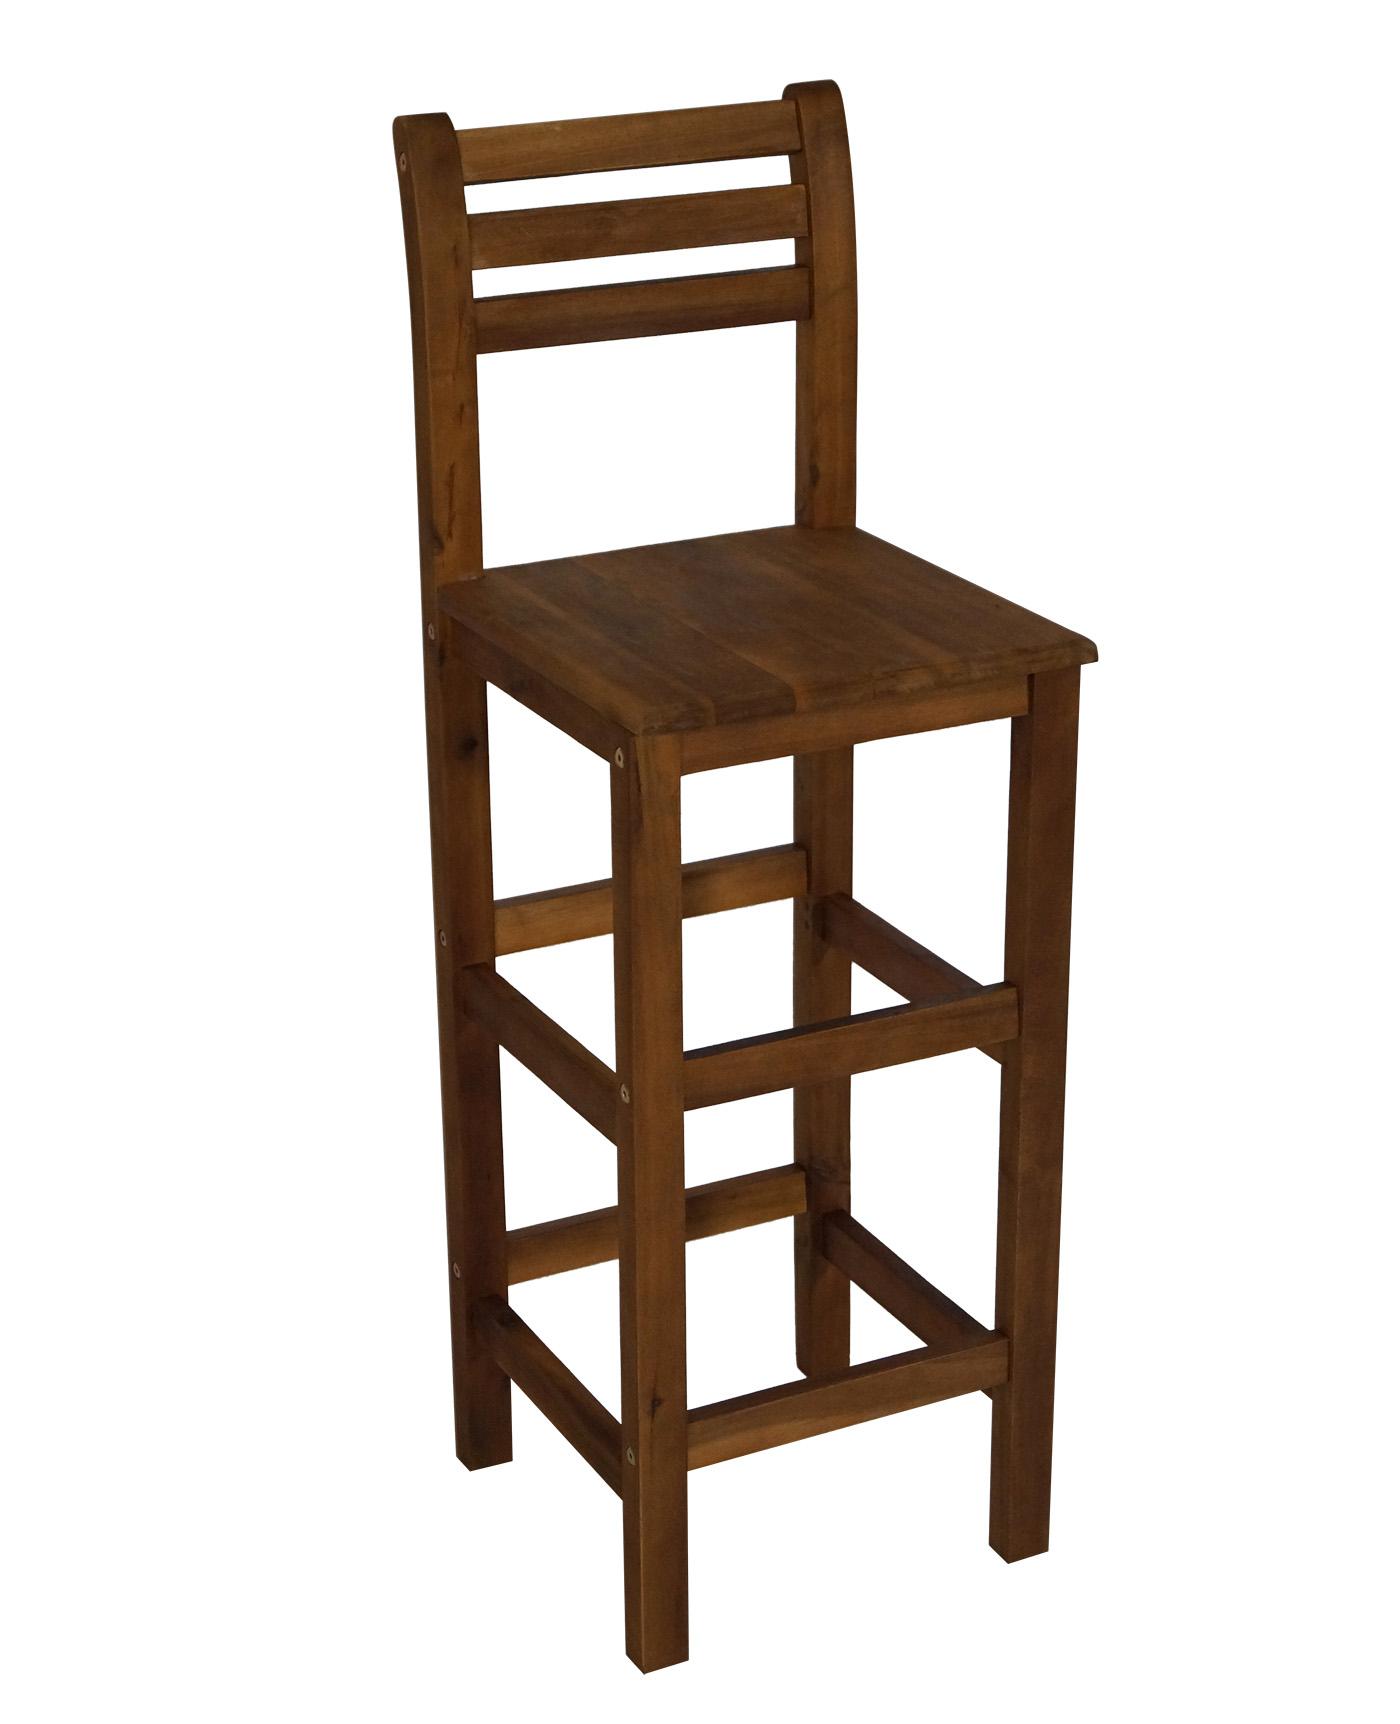 barstuhl barhocker benita mit r ckenlehne sitzh he 76 5cm akazie ge lt 2 wahl ebay. Black Bedroom Furniture Sets. Home Design Ideas